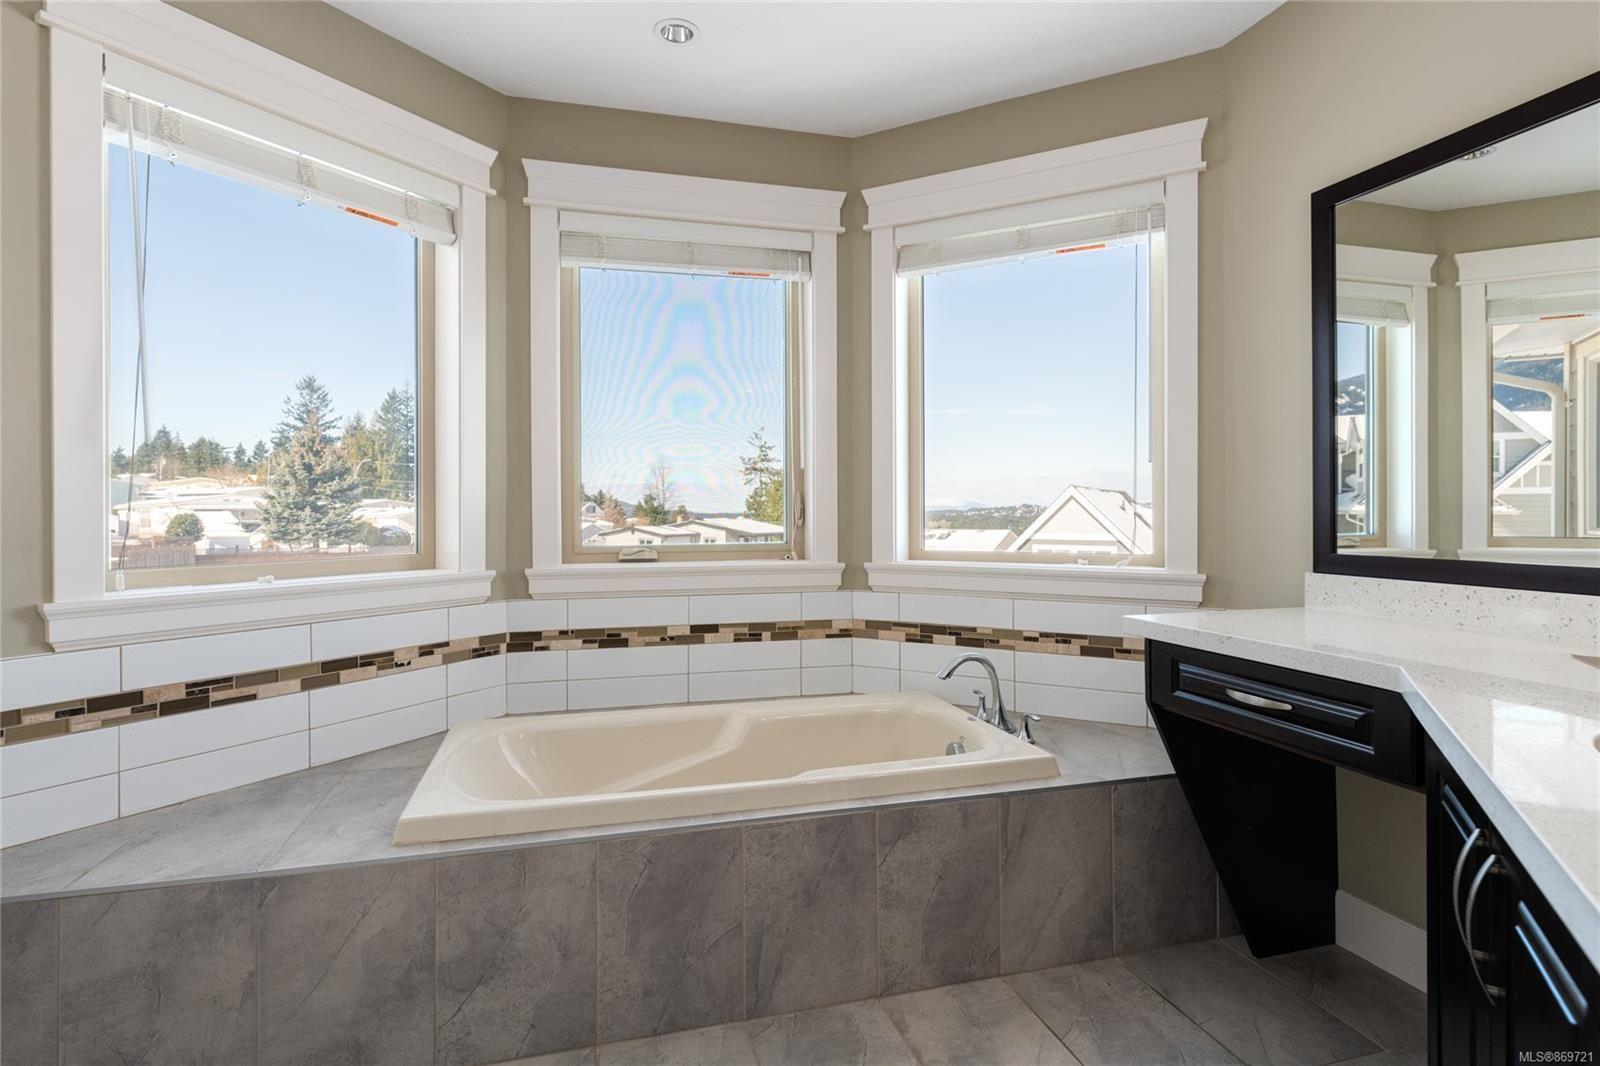 Photo 19: Photos: 2259 Leighton Rd in : Na South Jingle Pot House for sale (Nanaimo)  : MLS®# 869721